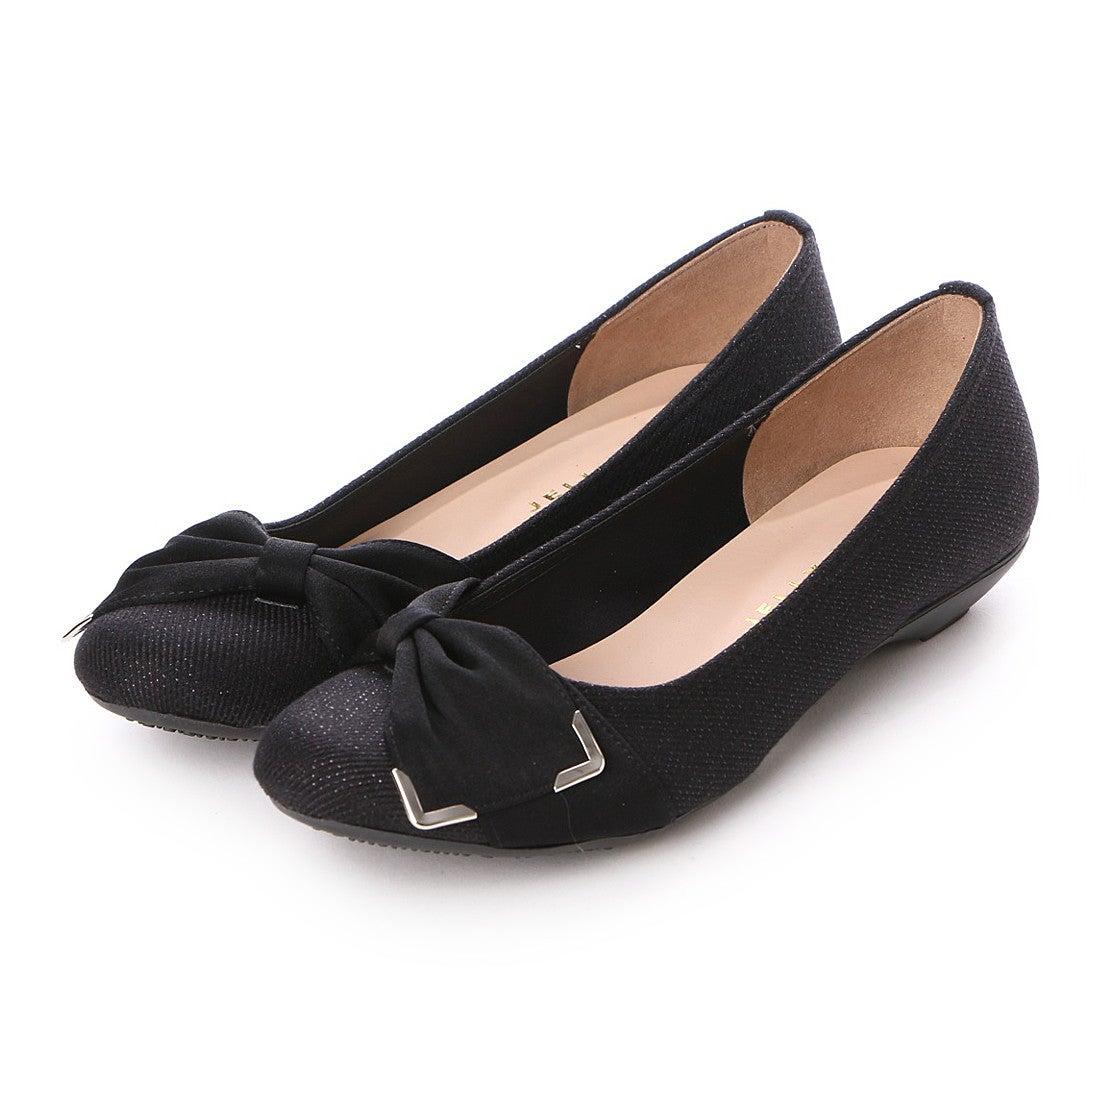 783029d9207a ジェリービーンズ JELLY BEANS 金具サイドリボンバレエパンプス 125-1375 (黒) -靴&ファッション通販  ロコンド〜自宅で試着、気軽に返品